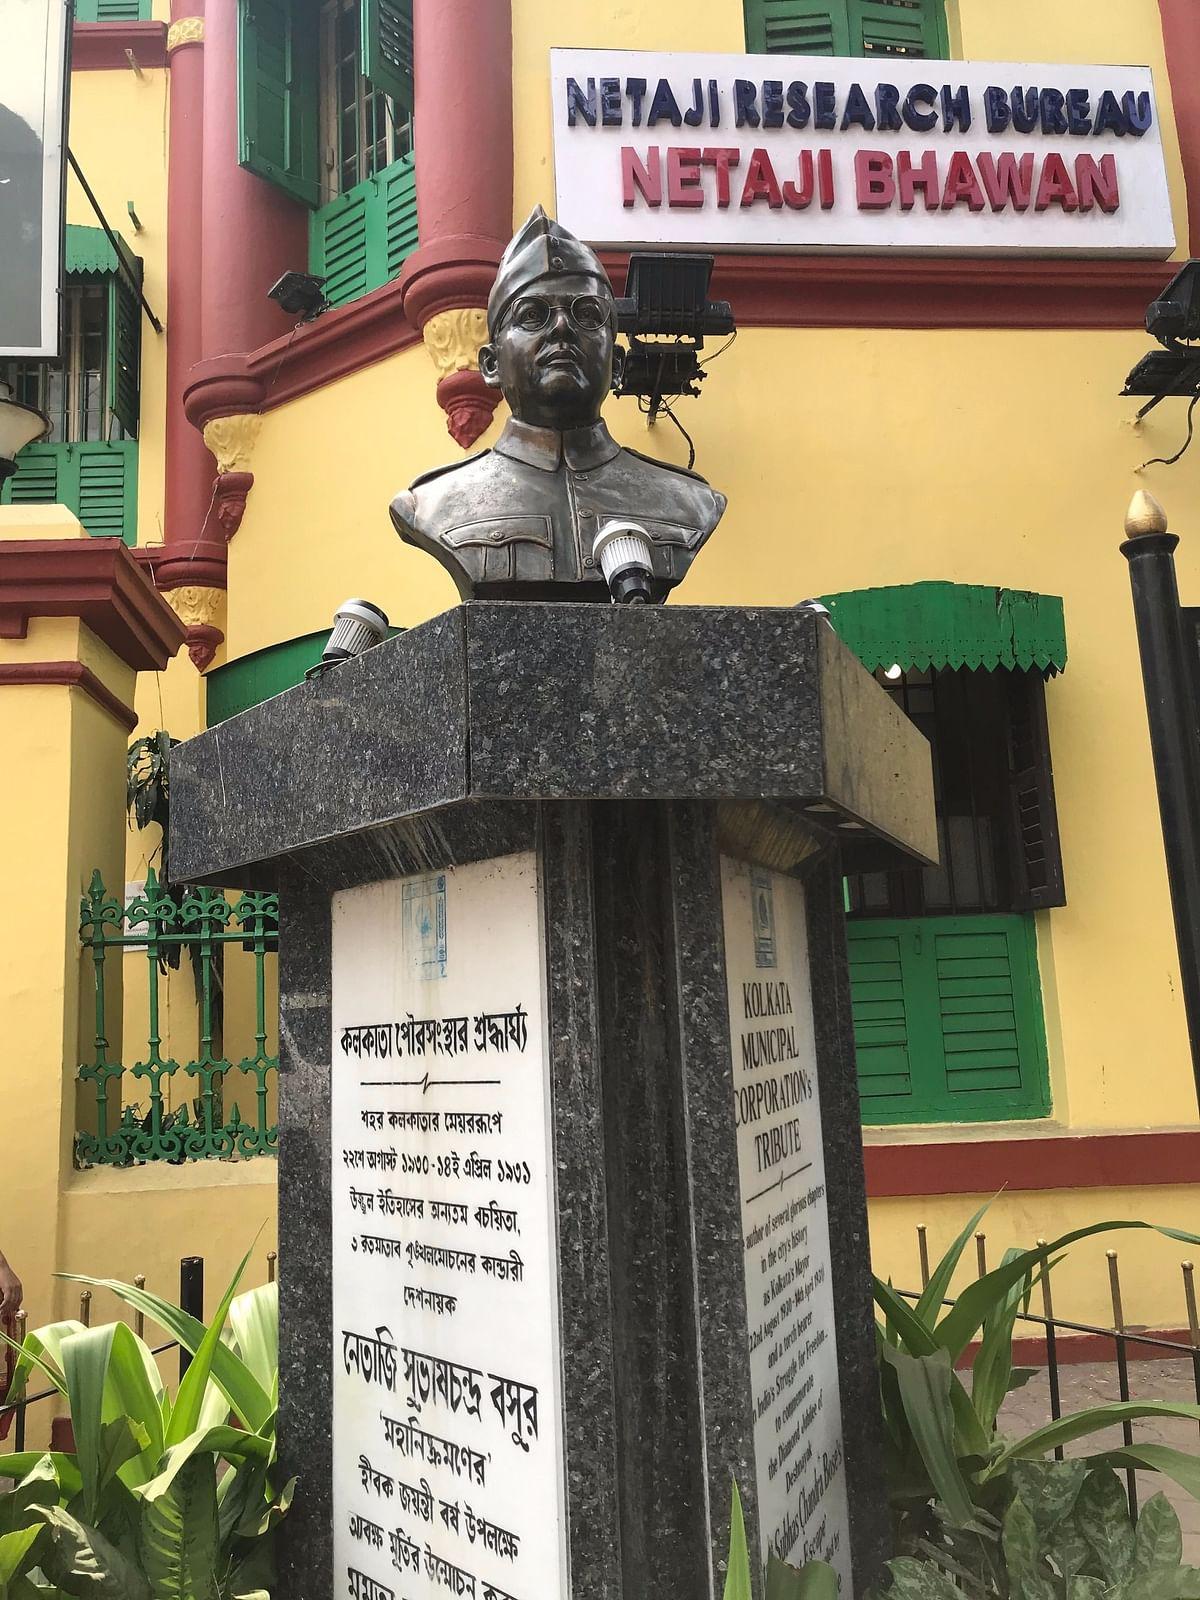 Netaji Bose Museum in Kolkata